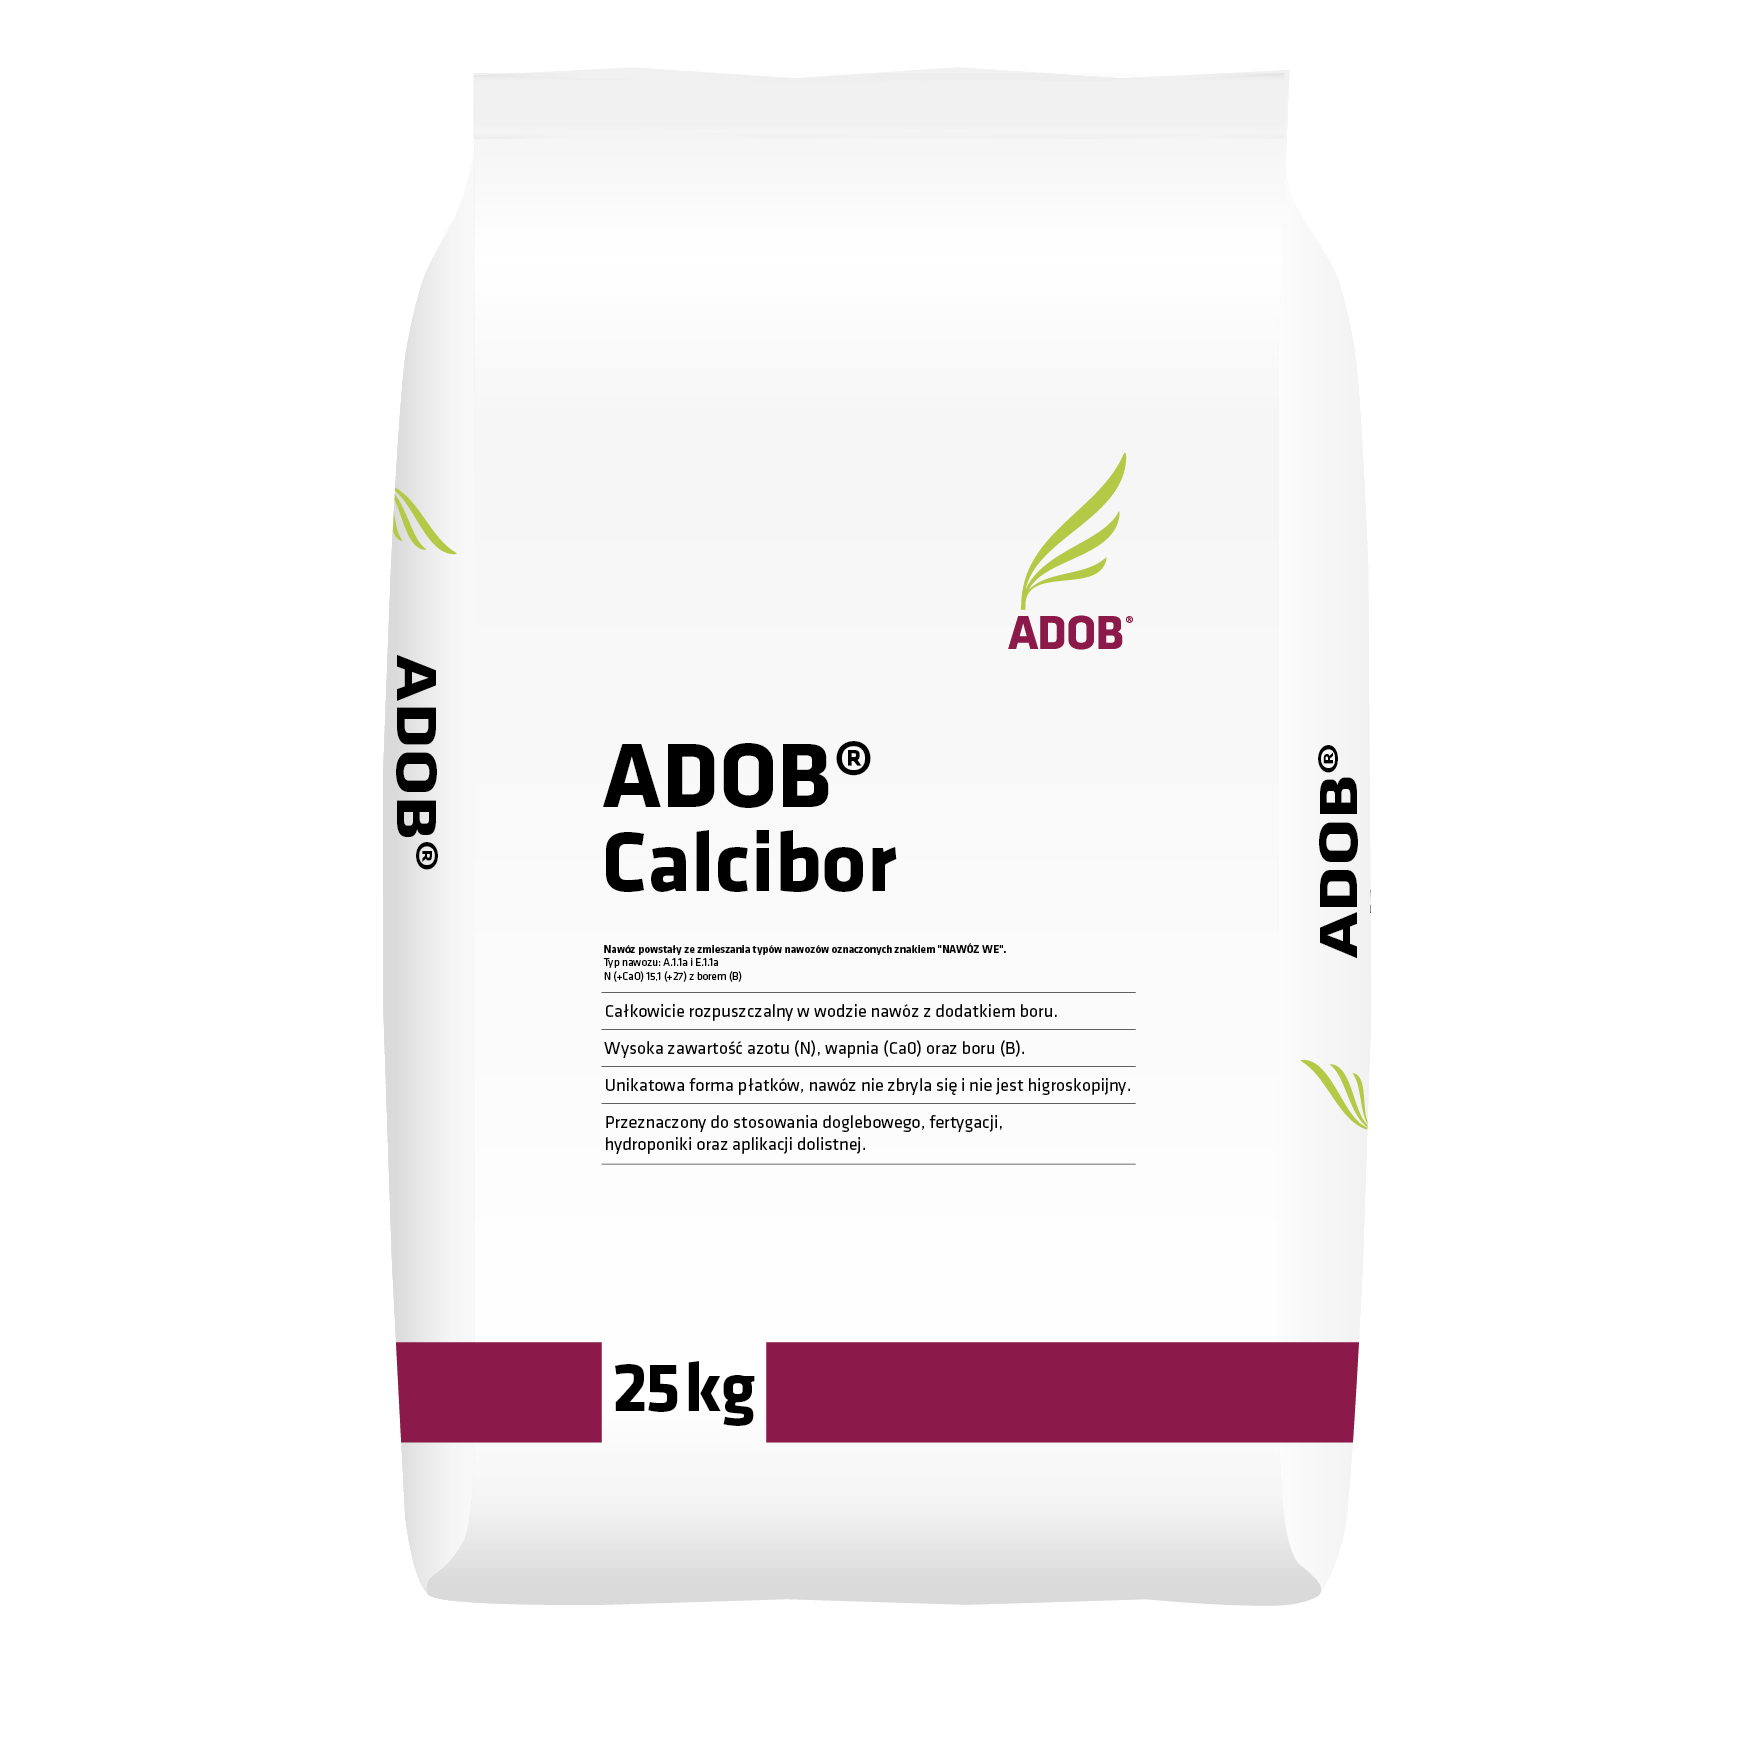 ADOB Calcibor